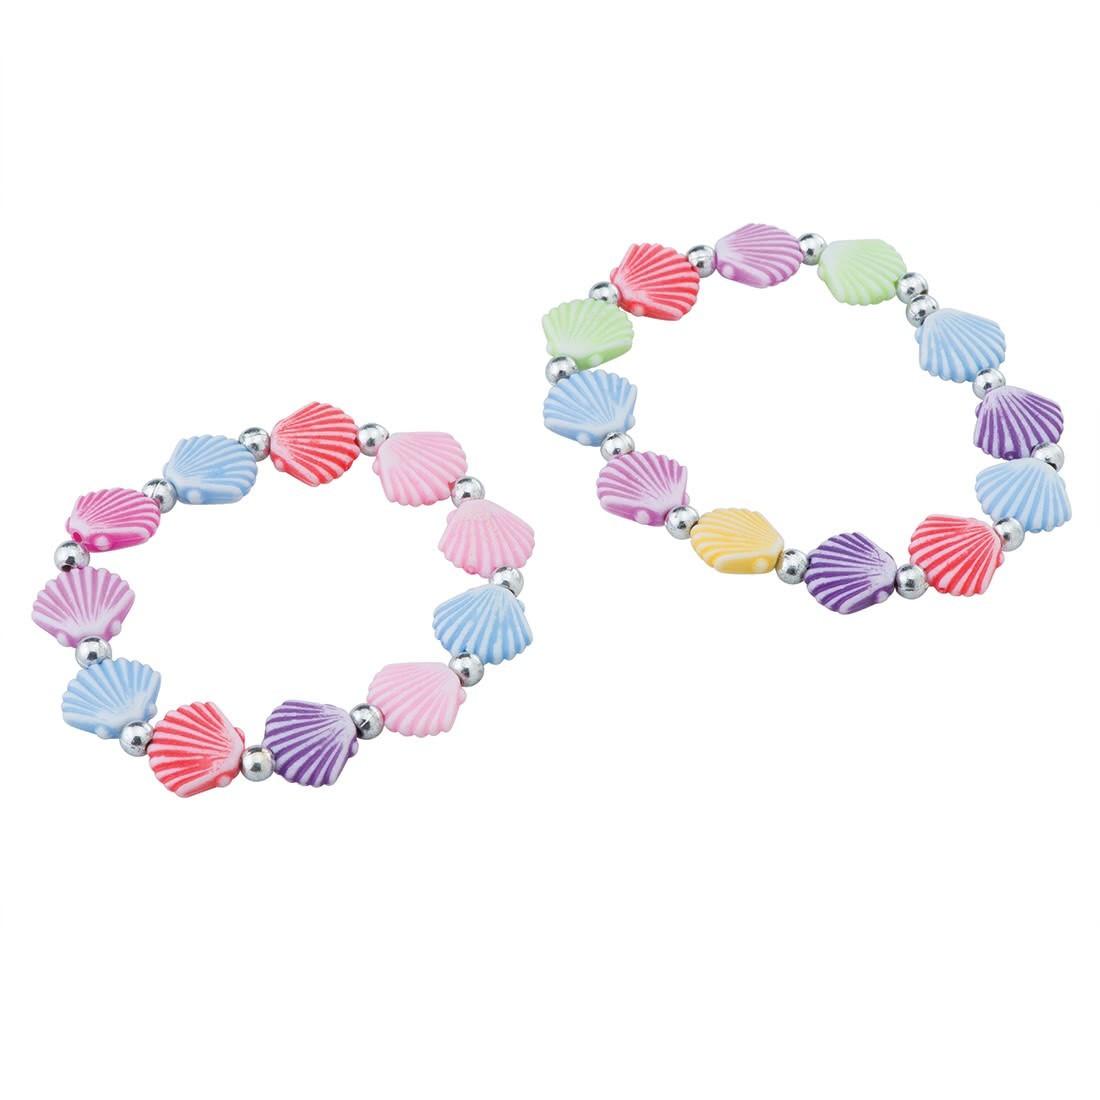 Seashell Bracelets [image]